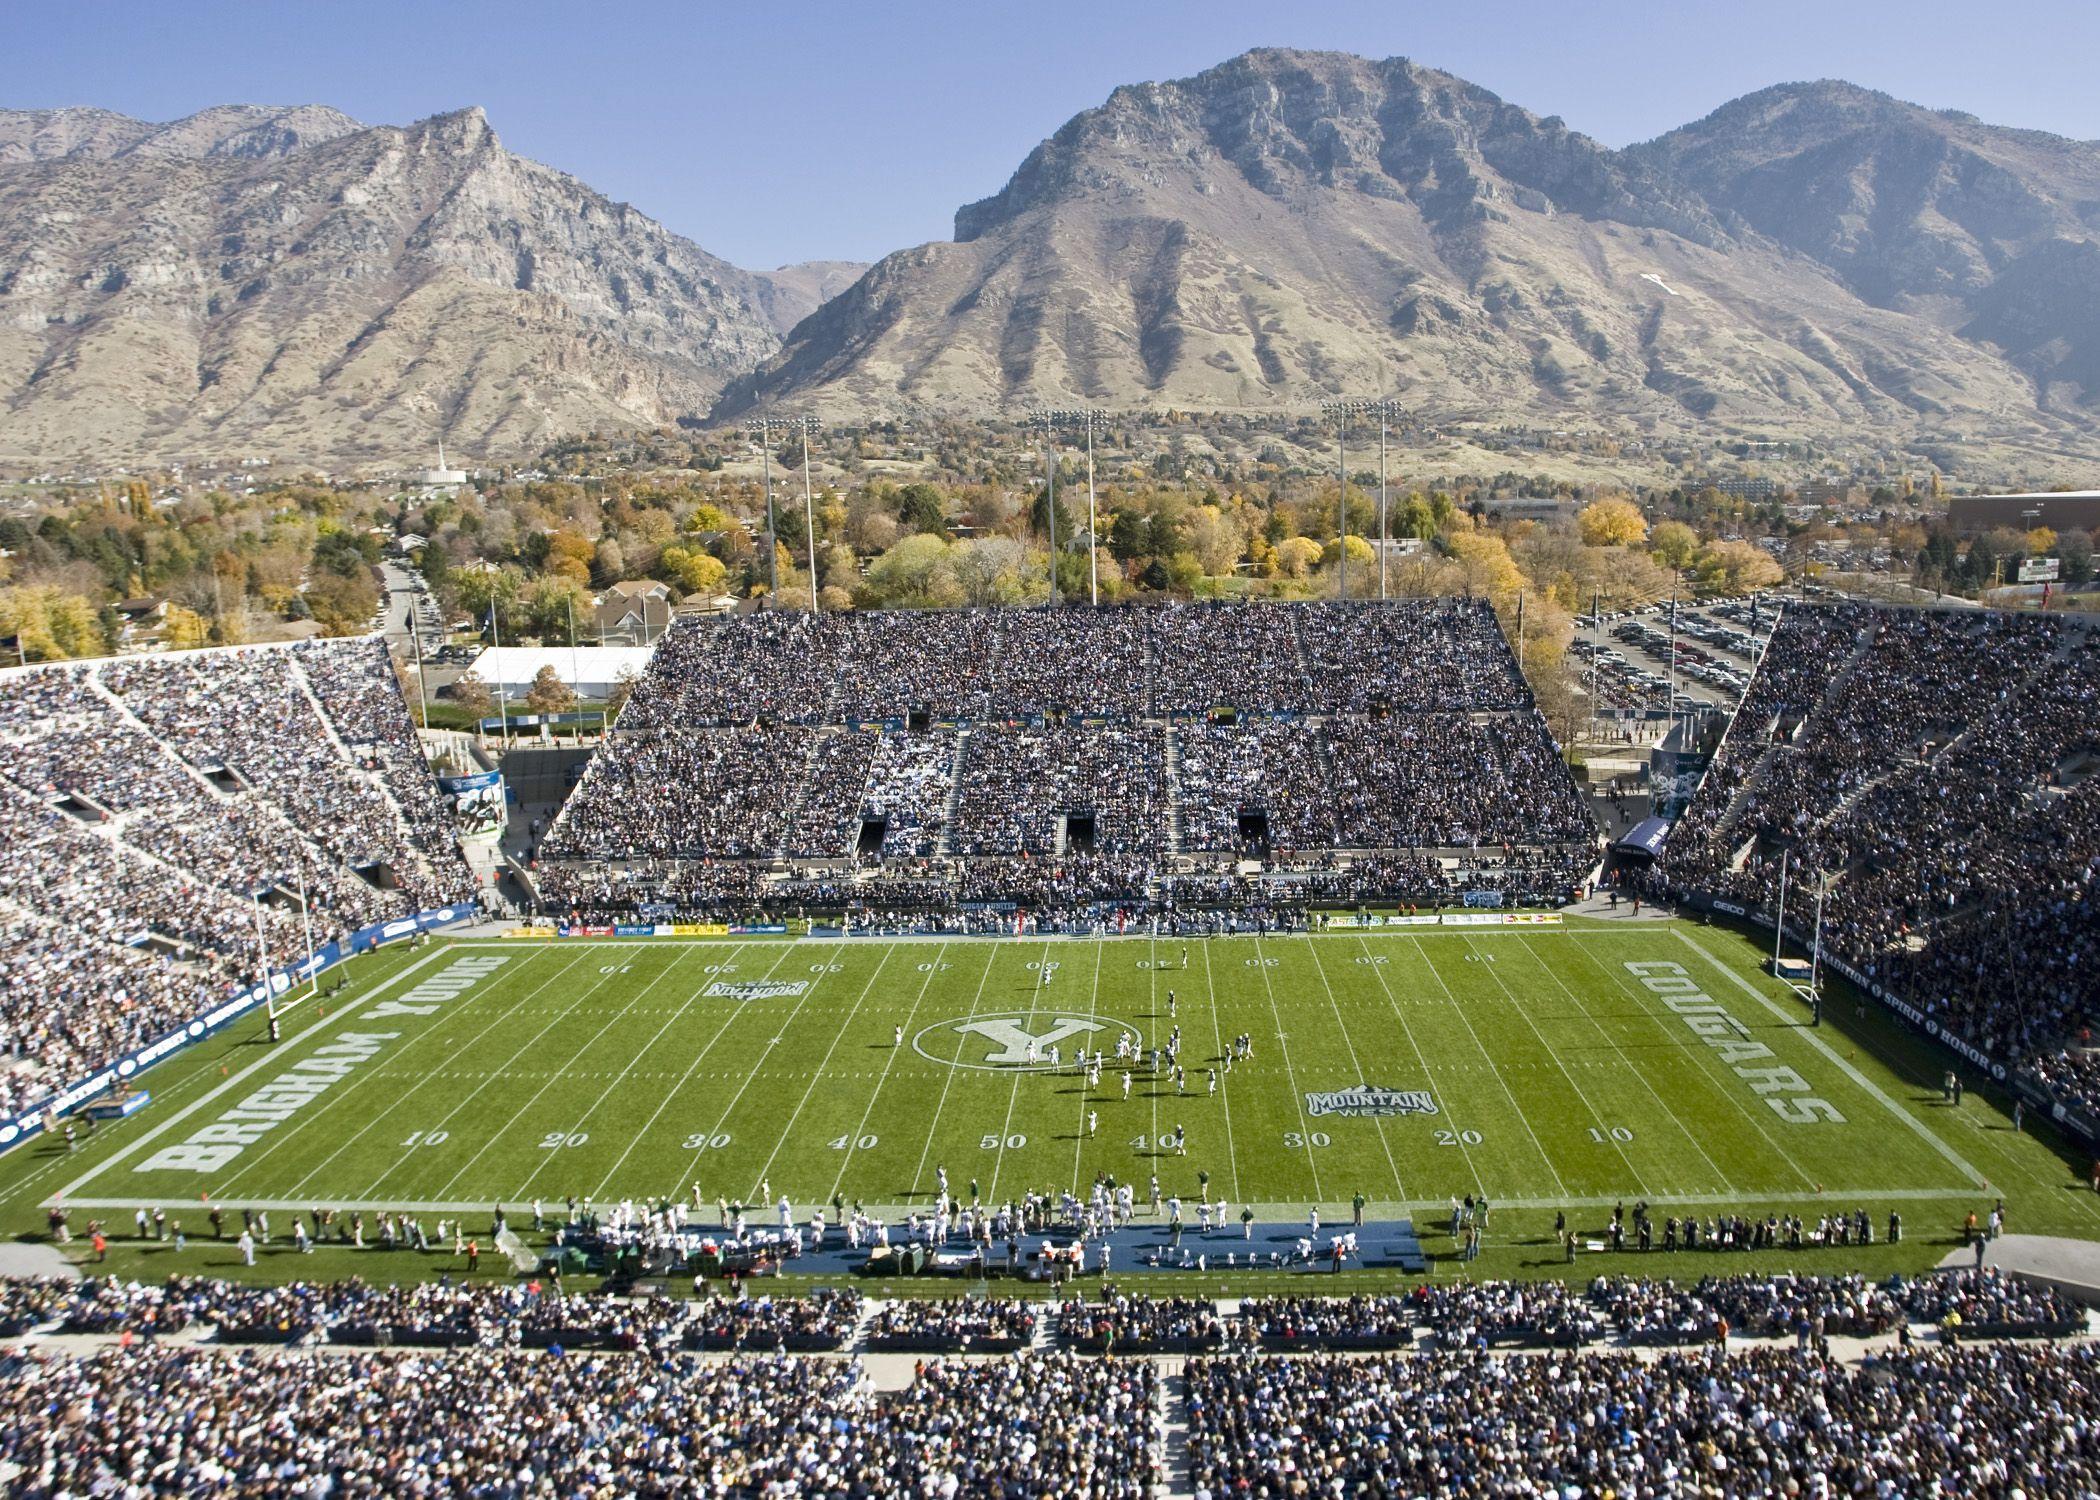 college football stadiums | Unique College Football Stadiums